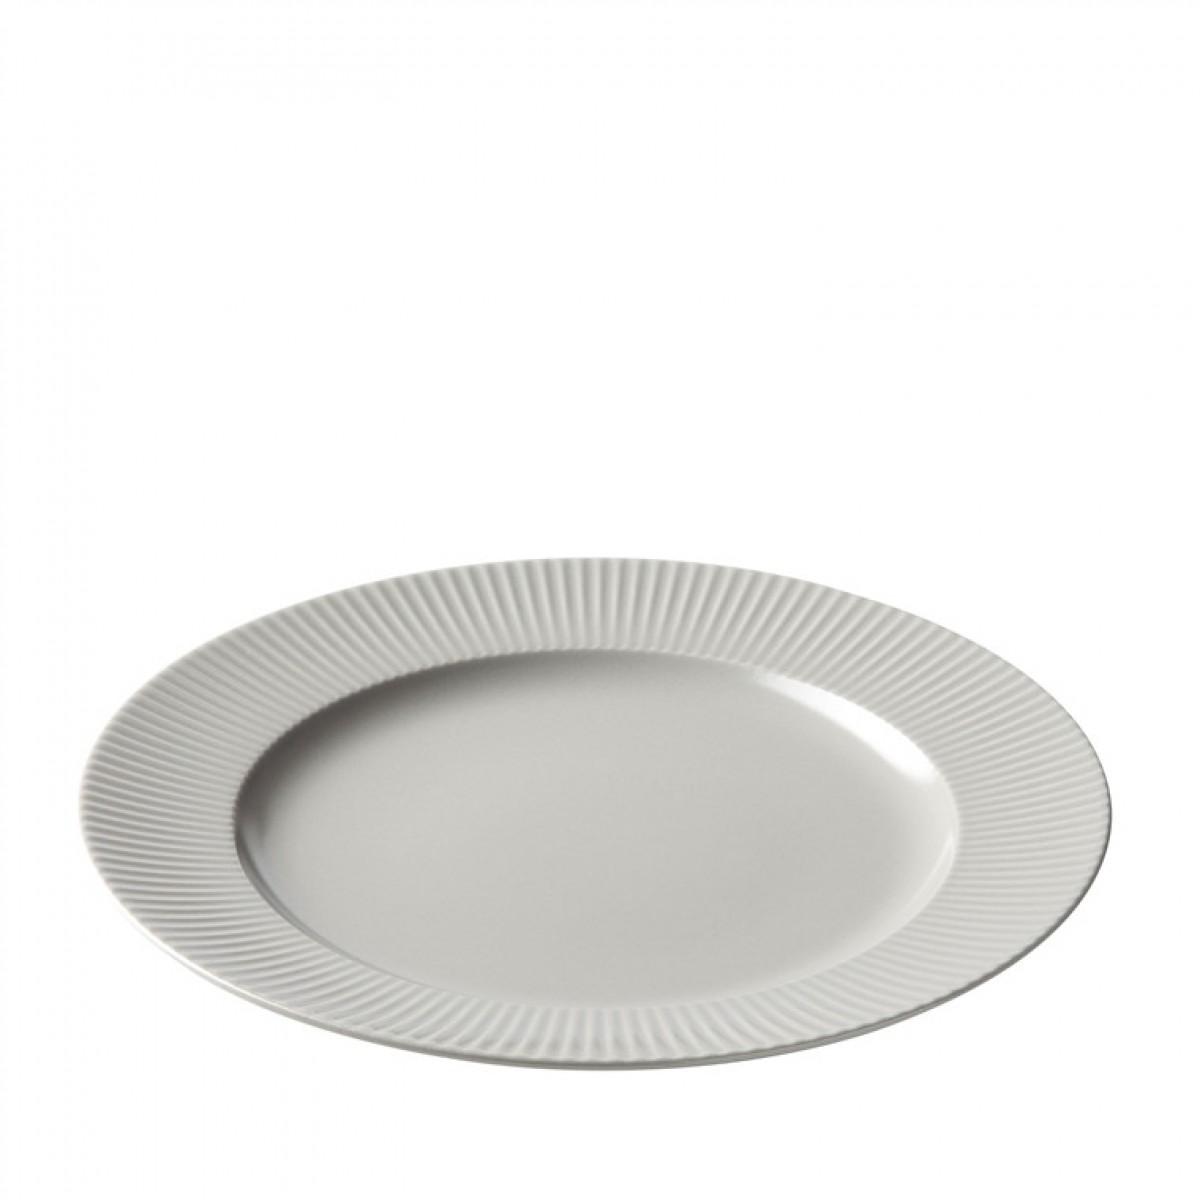 AIDA Groovy tallerken 27 cm grå